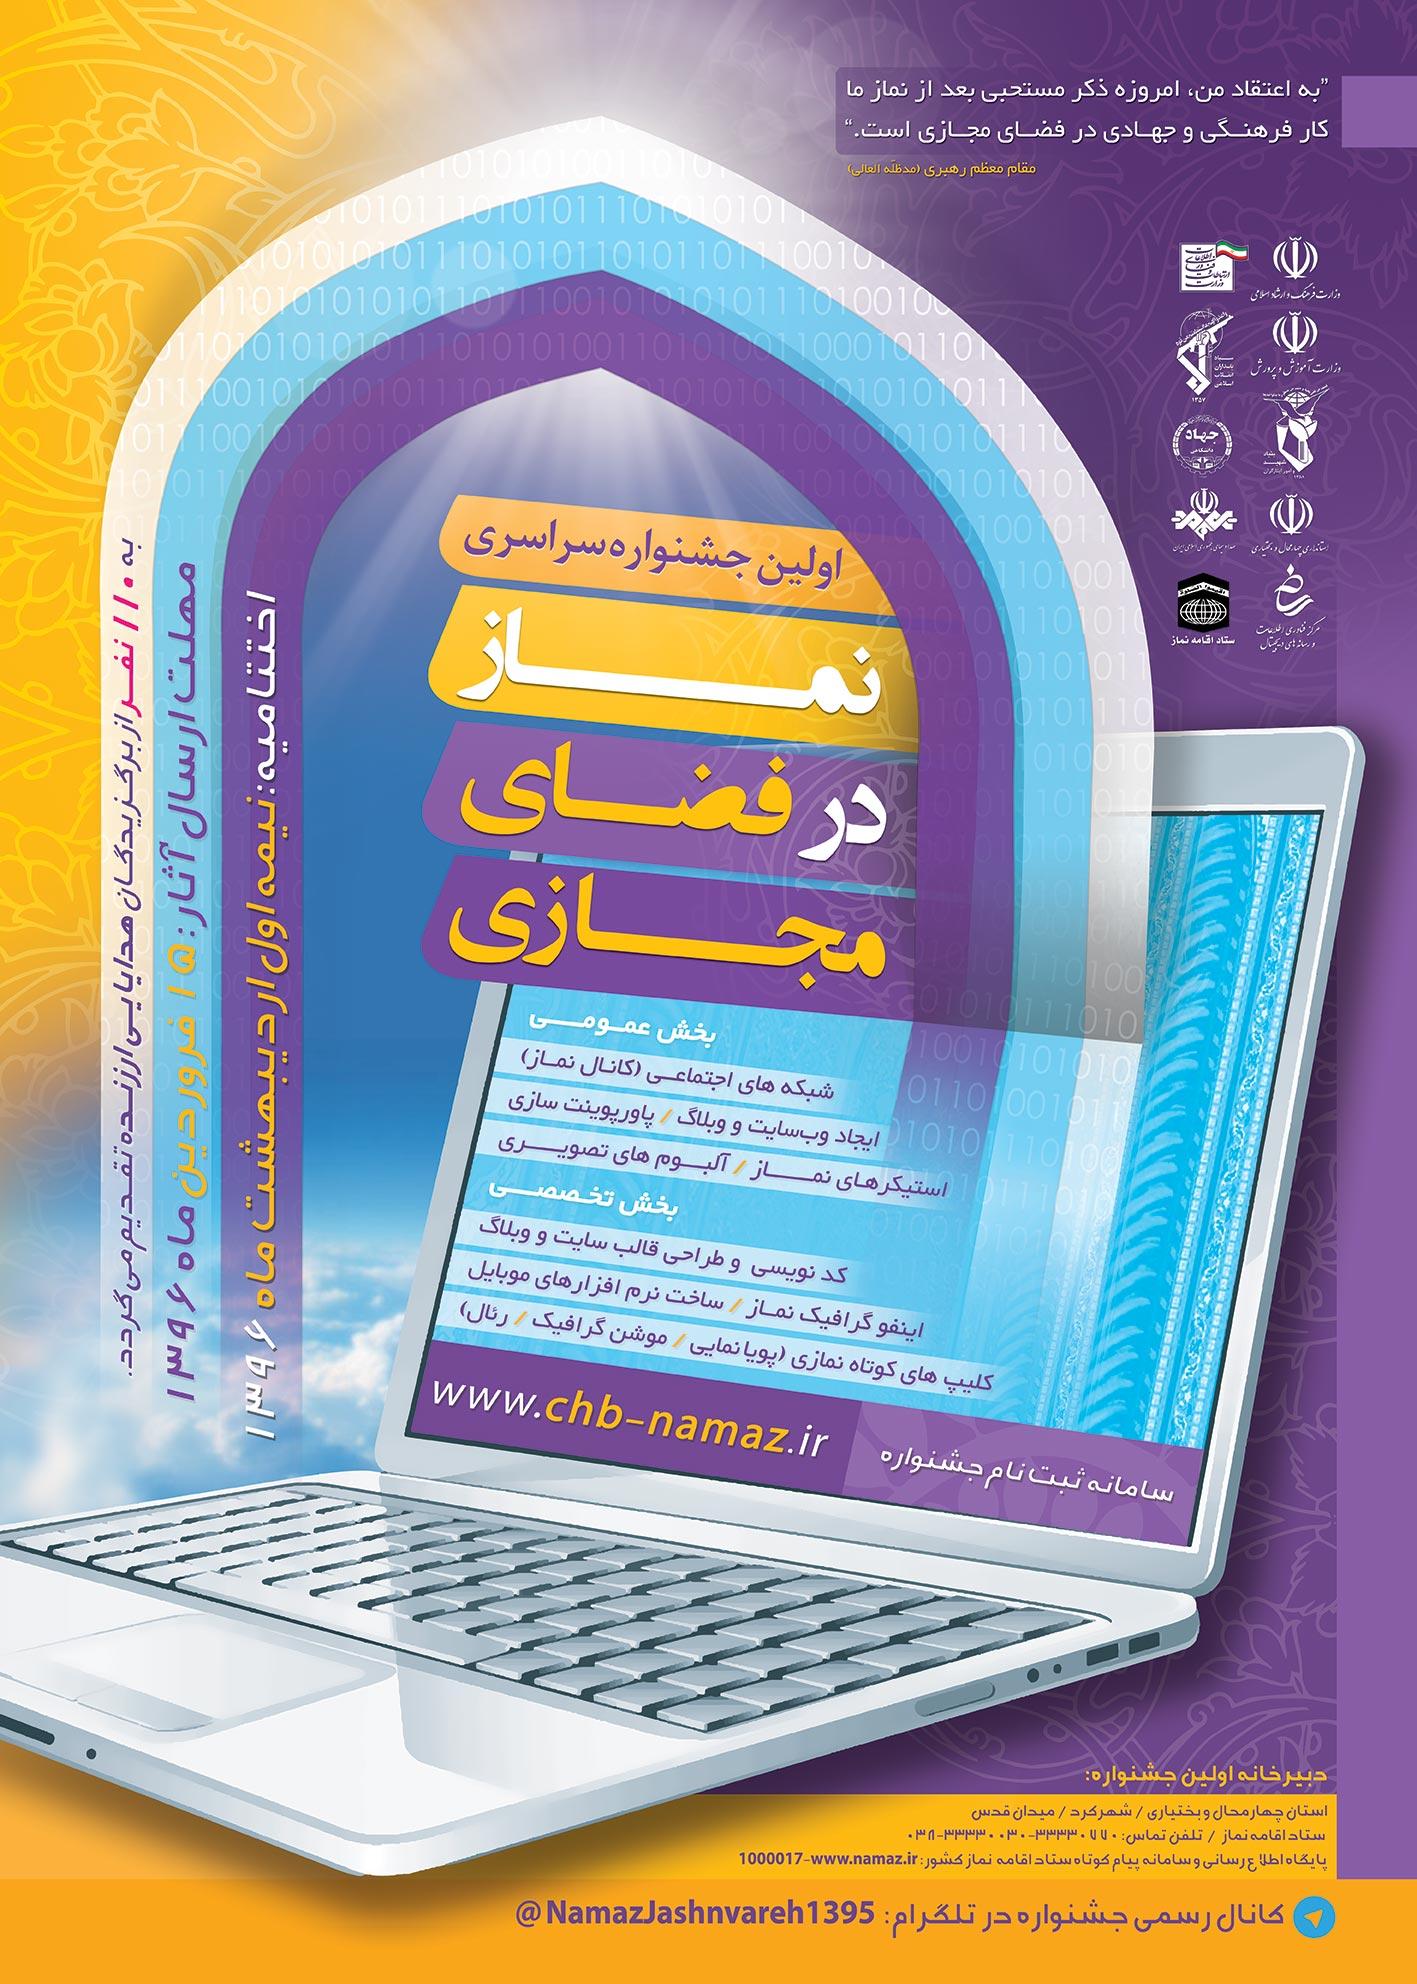 Image result for جشنواره سراسری نماز در فضای مجازی